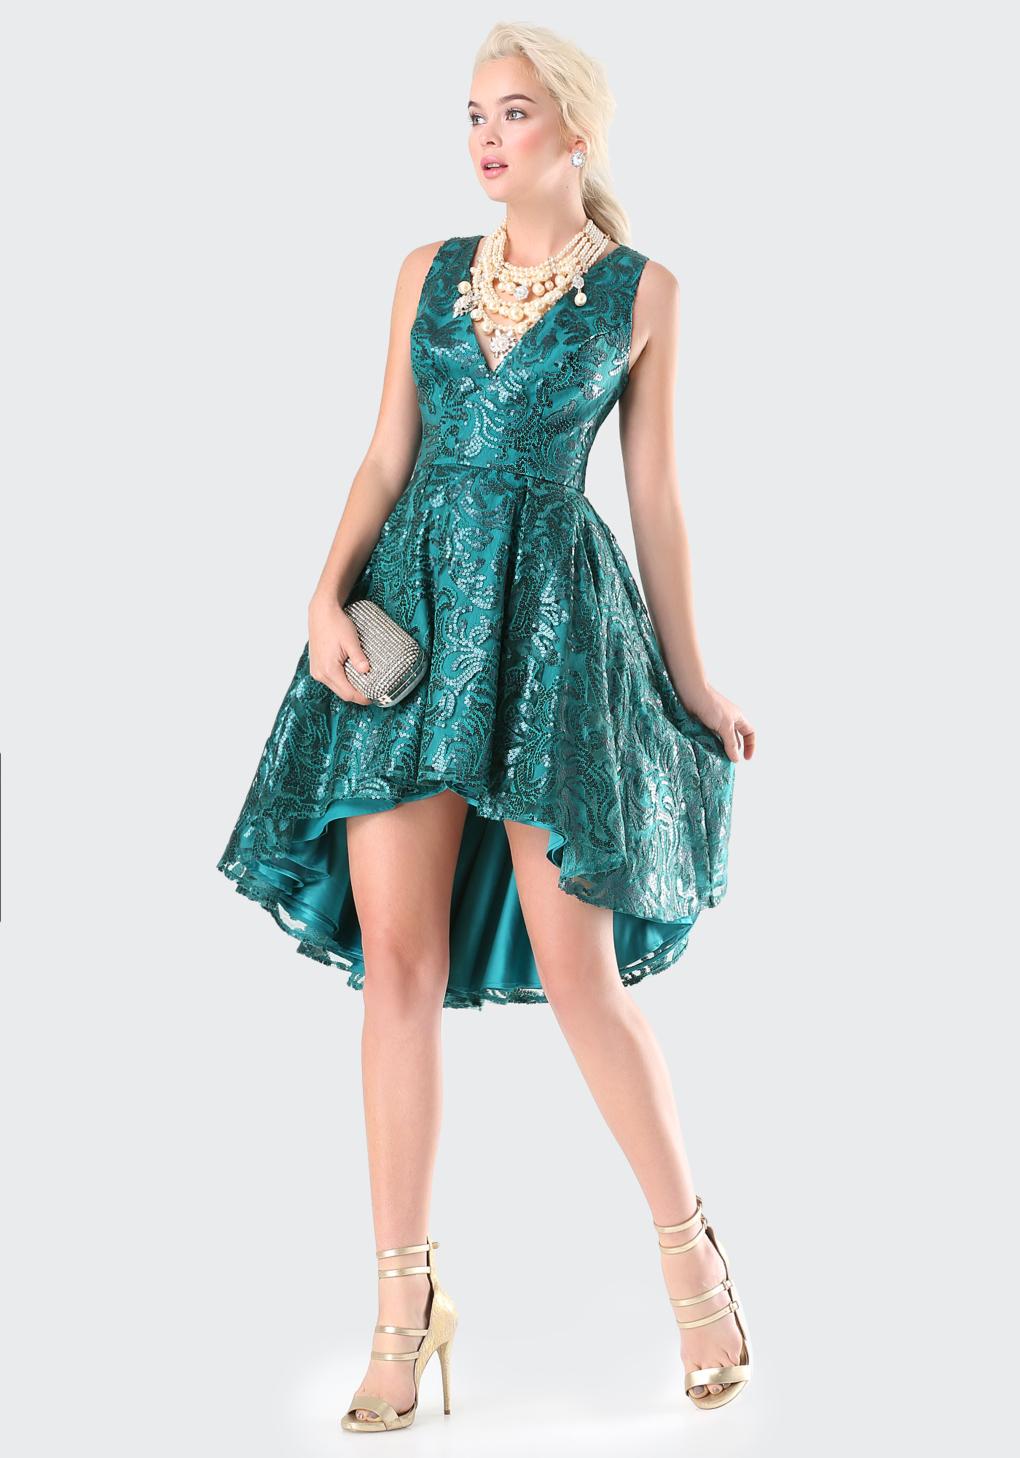 Lyst - Bebe Petite Sequin Hi-lo Dress in Blue